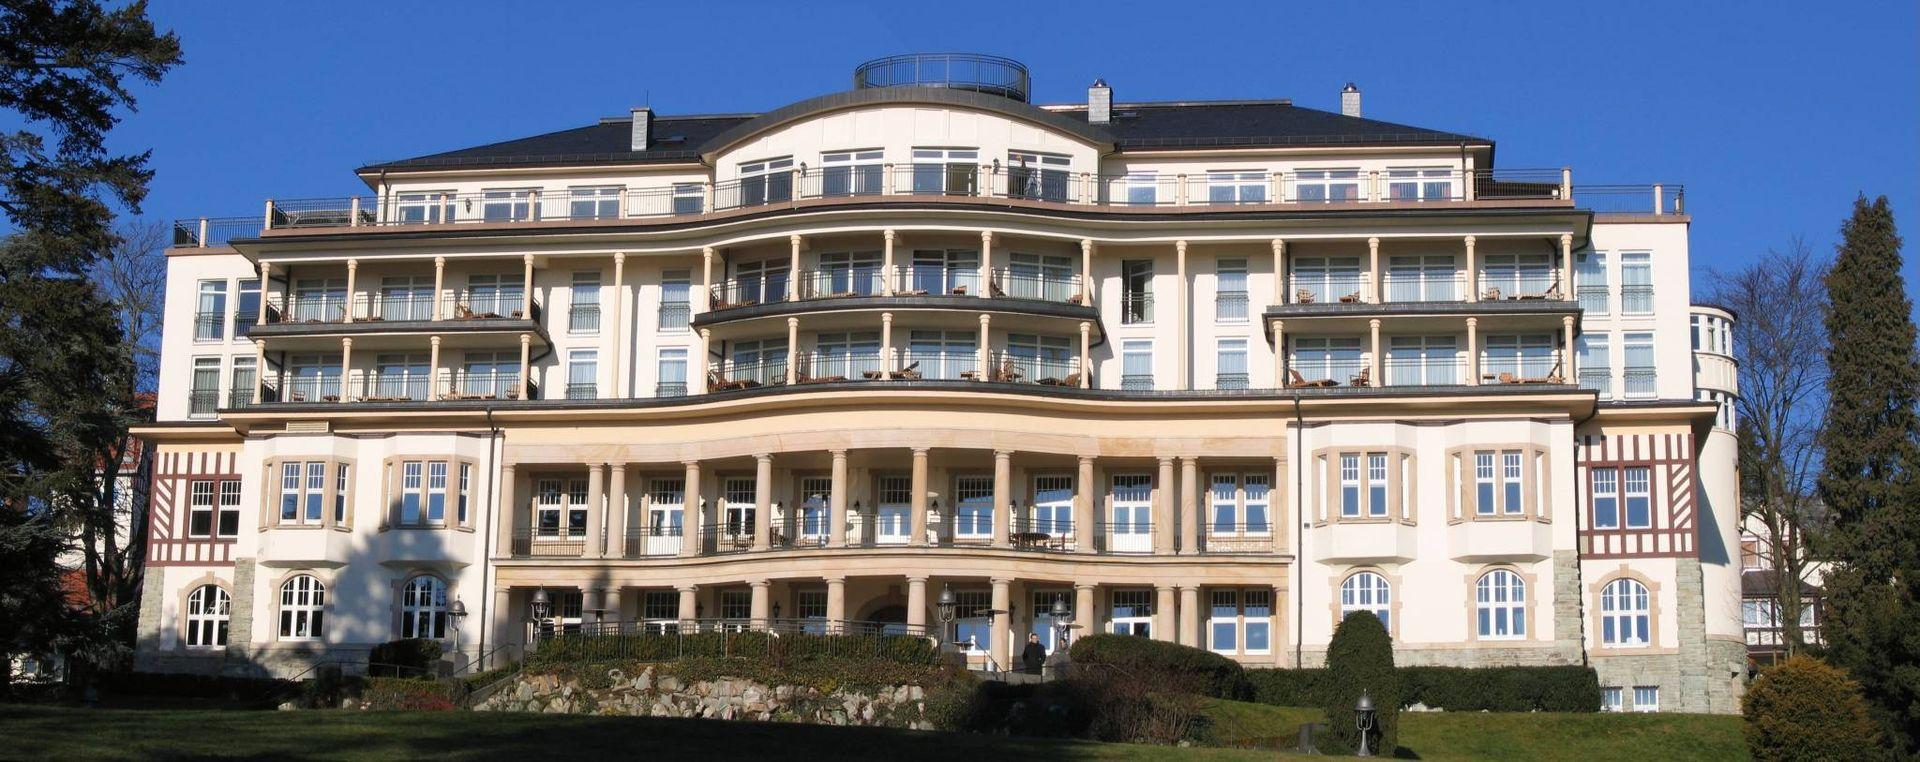 Bild Kempinski Hotel Falkenstein